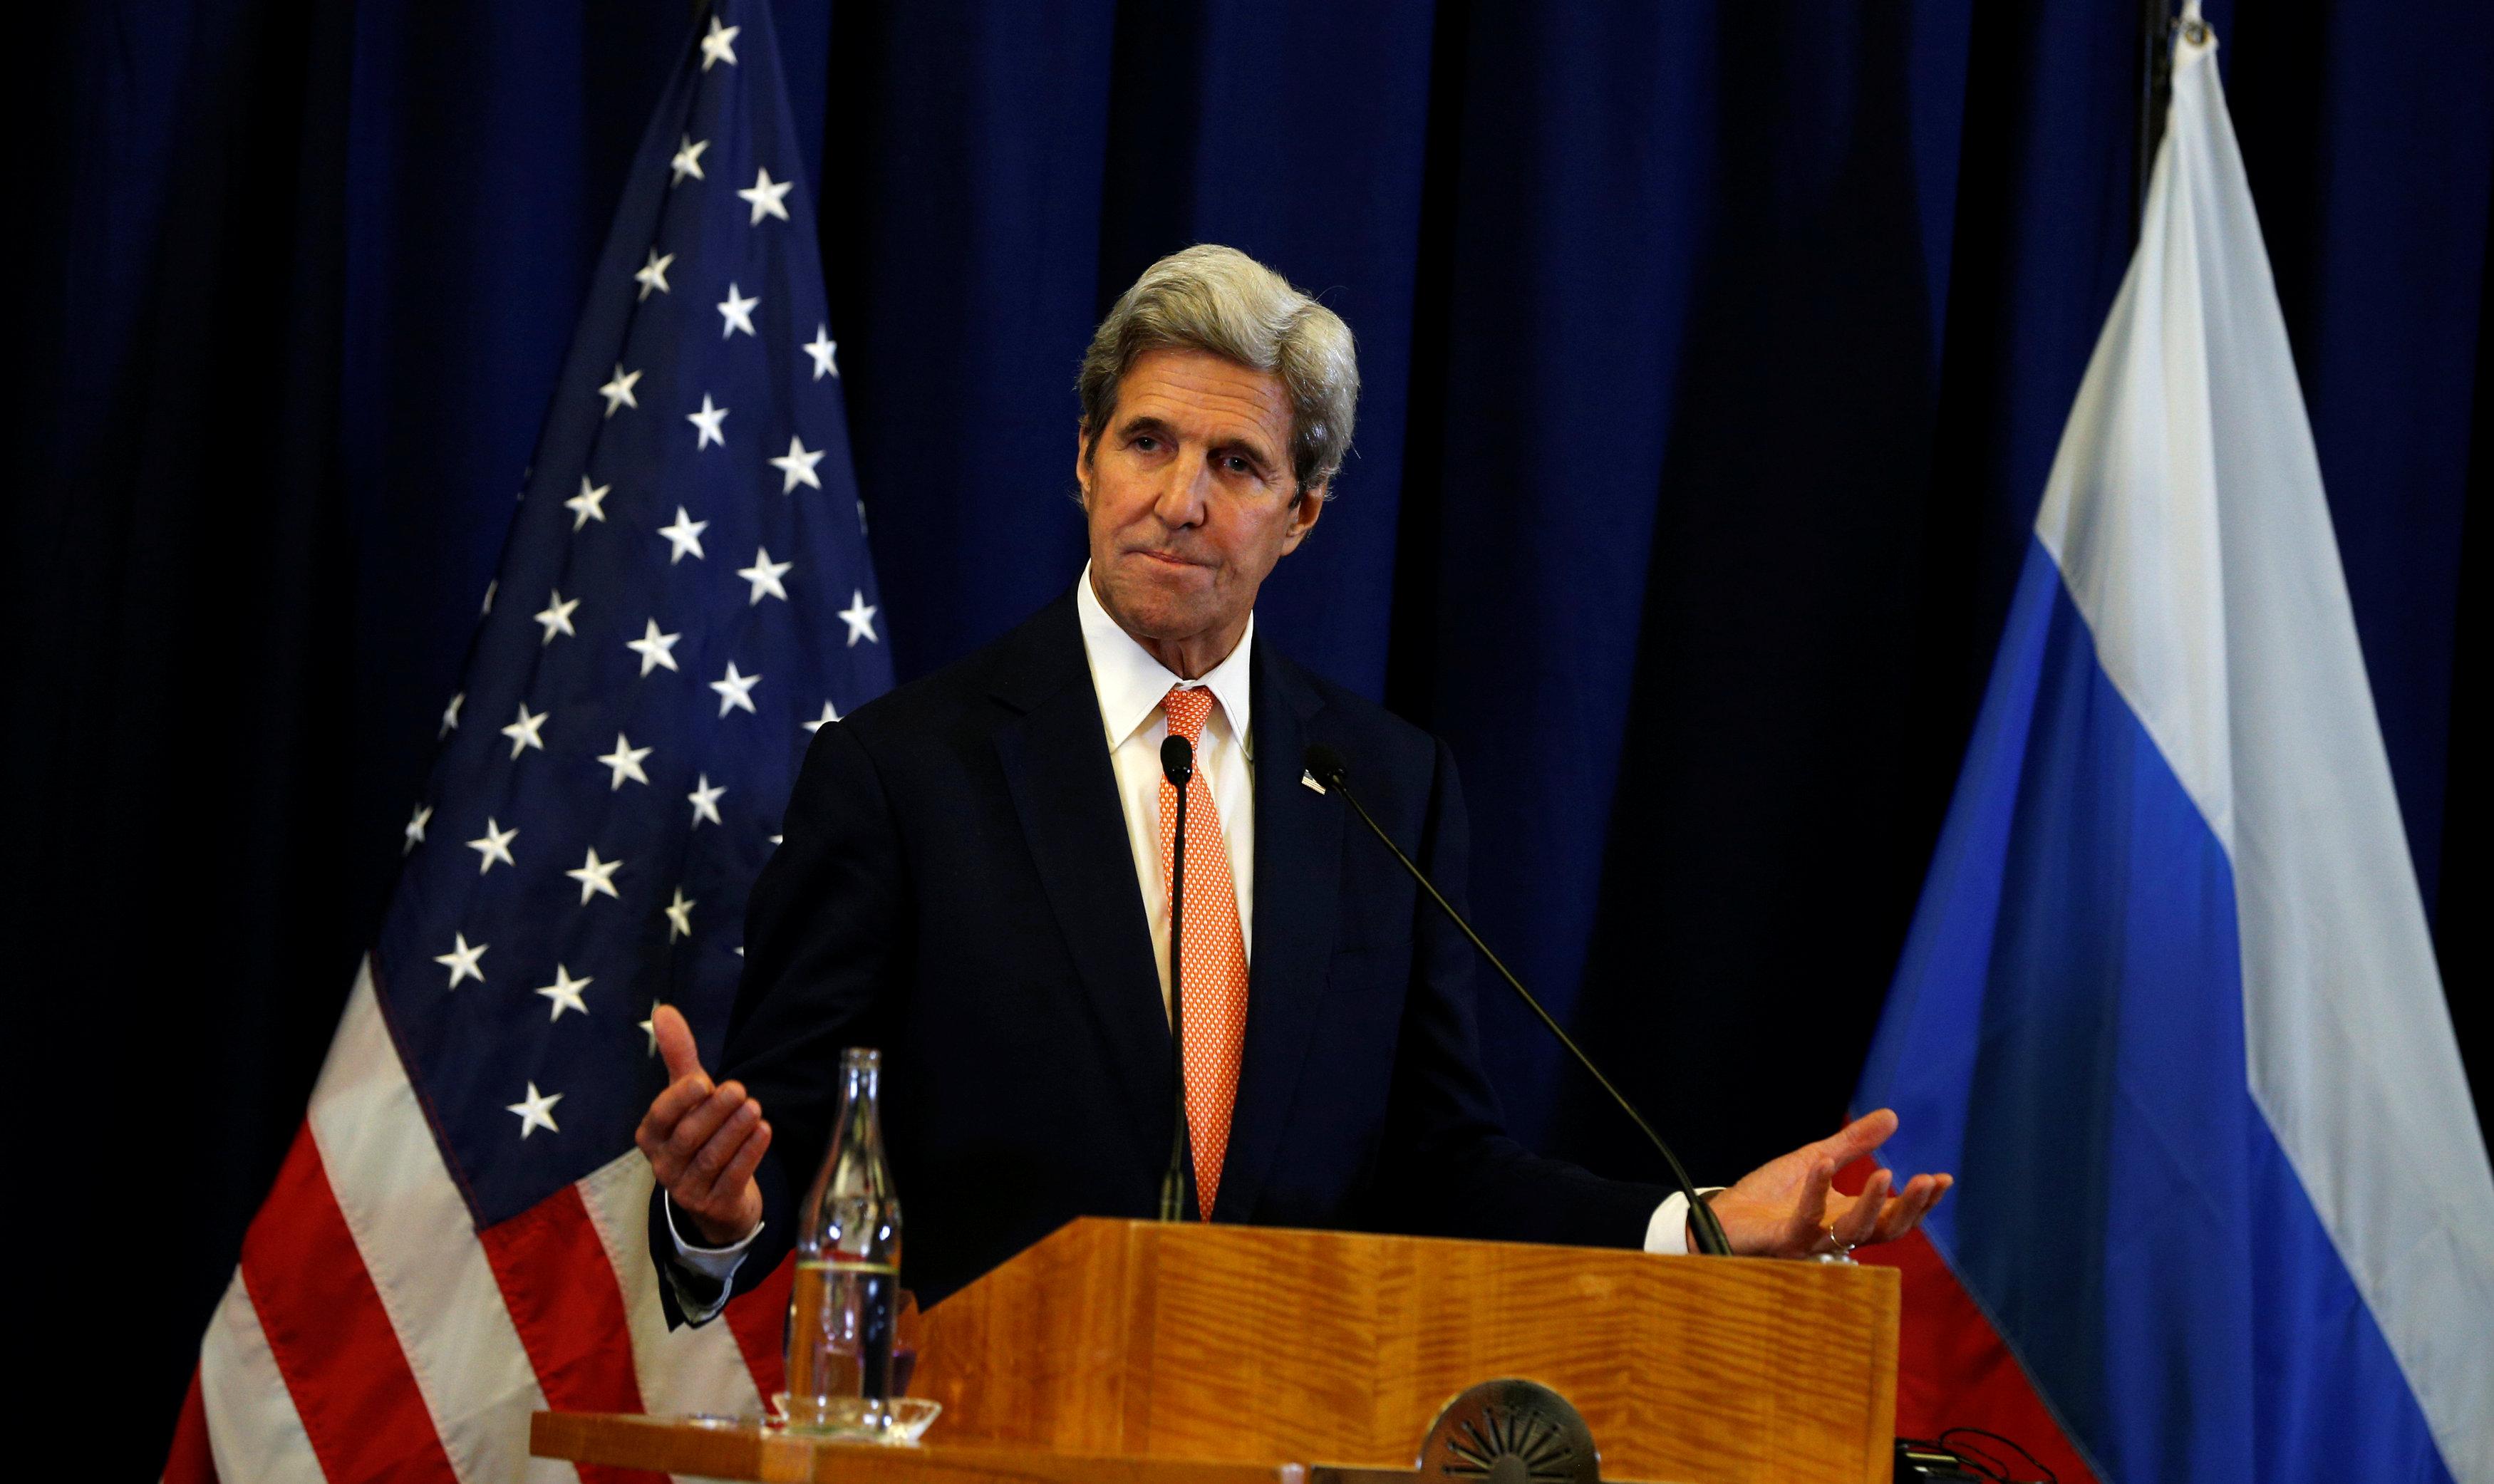 Kerry hands 2016 09 09T232334Z 1342888076 S1AEUAJVPUAB RTRMADP 3 MIDEAST CRISIS SYRIA KERRY